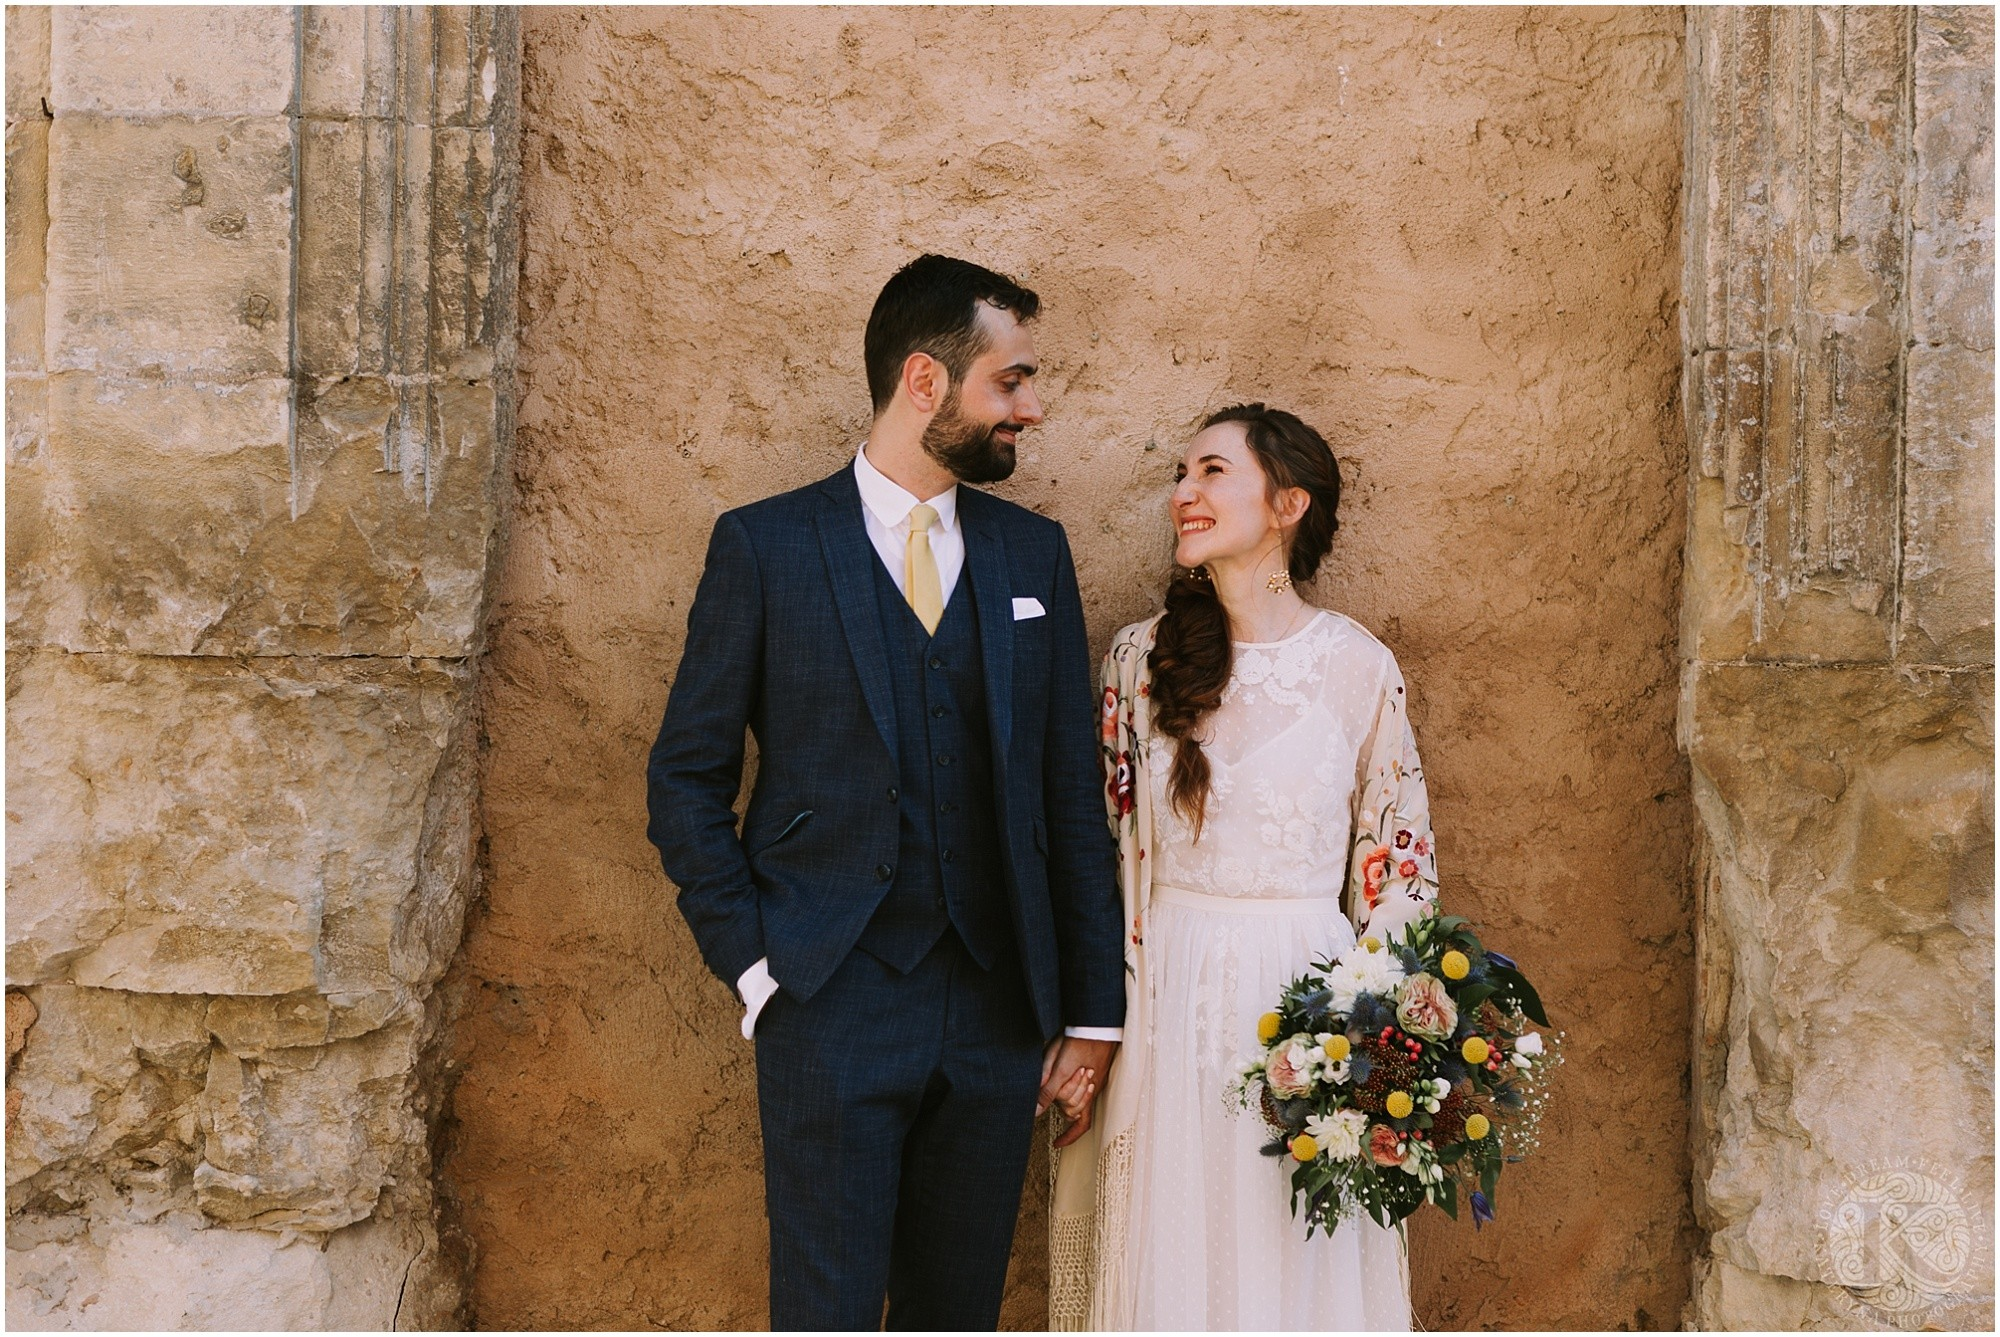 Kateryna-photos-photographe-mariage-vaucluse-provence-avignon-ferme-st-hugues_0044.jpg